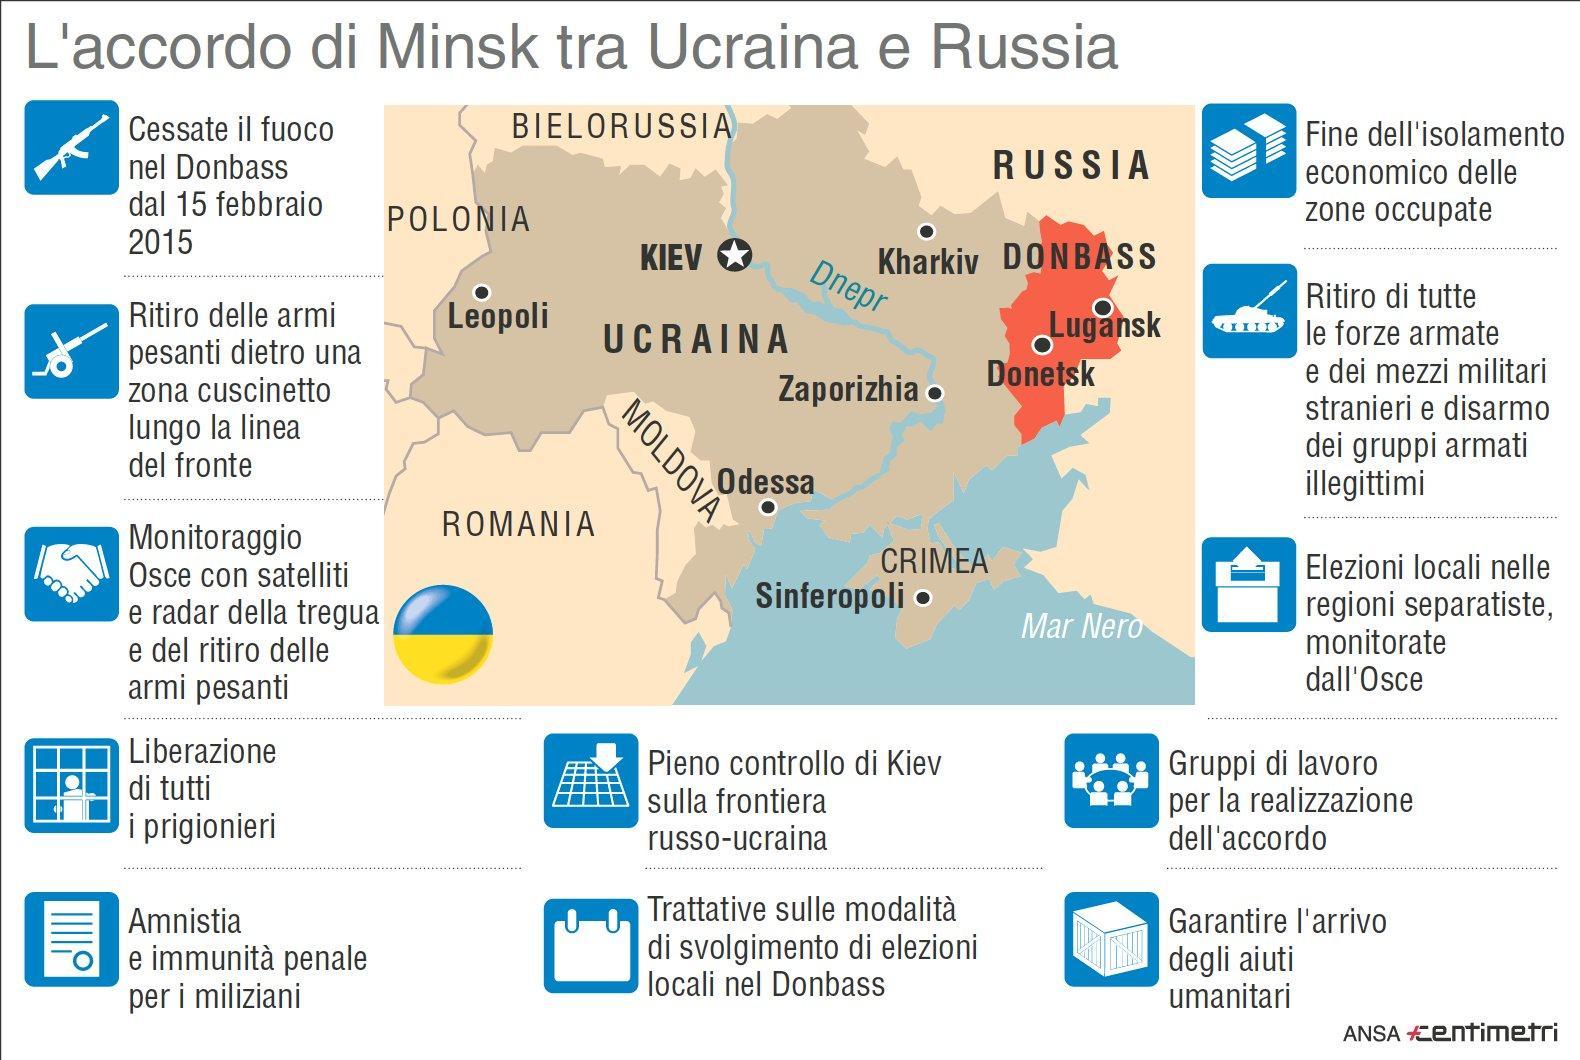 G20, l accordo di Minsk tra Ucraina e Russia